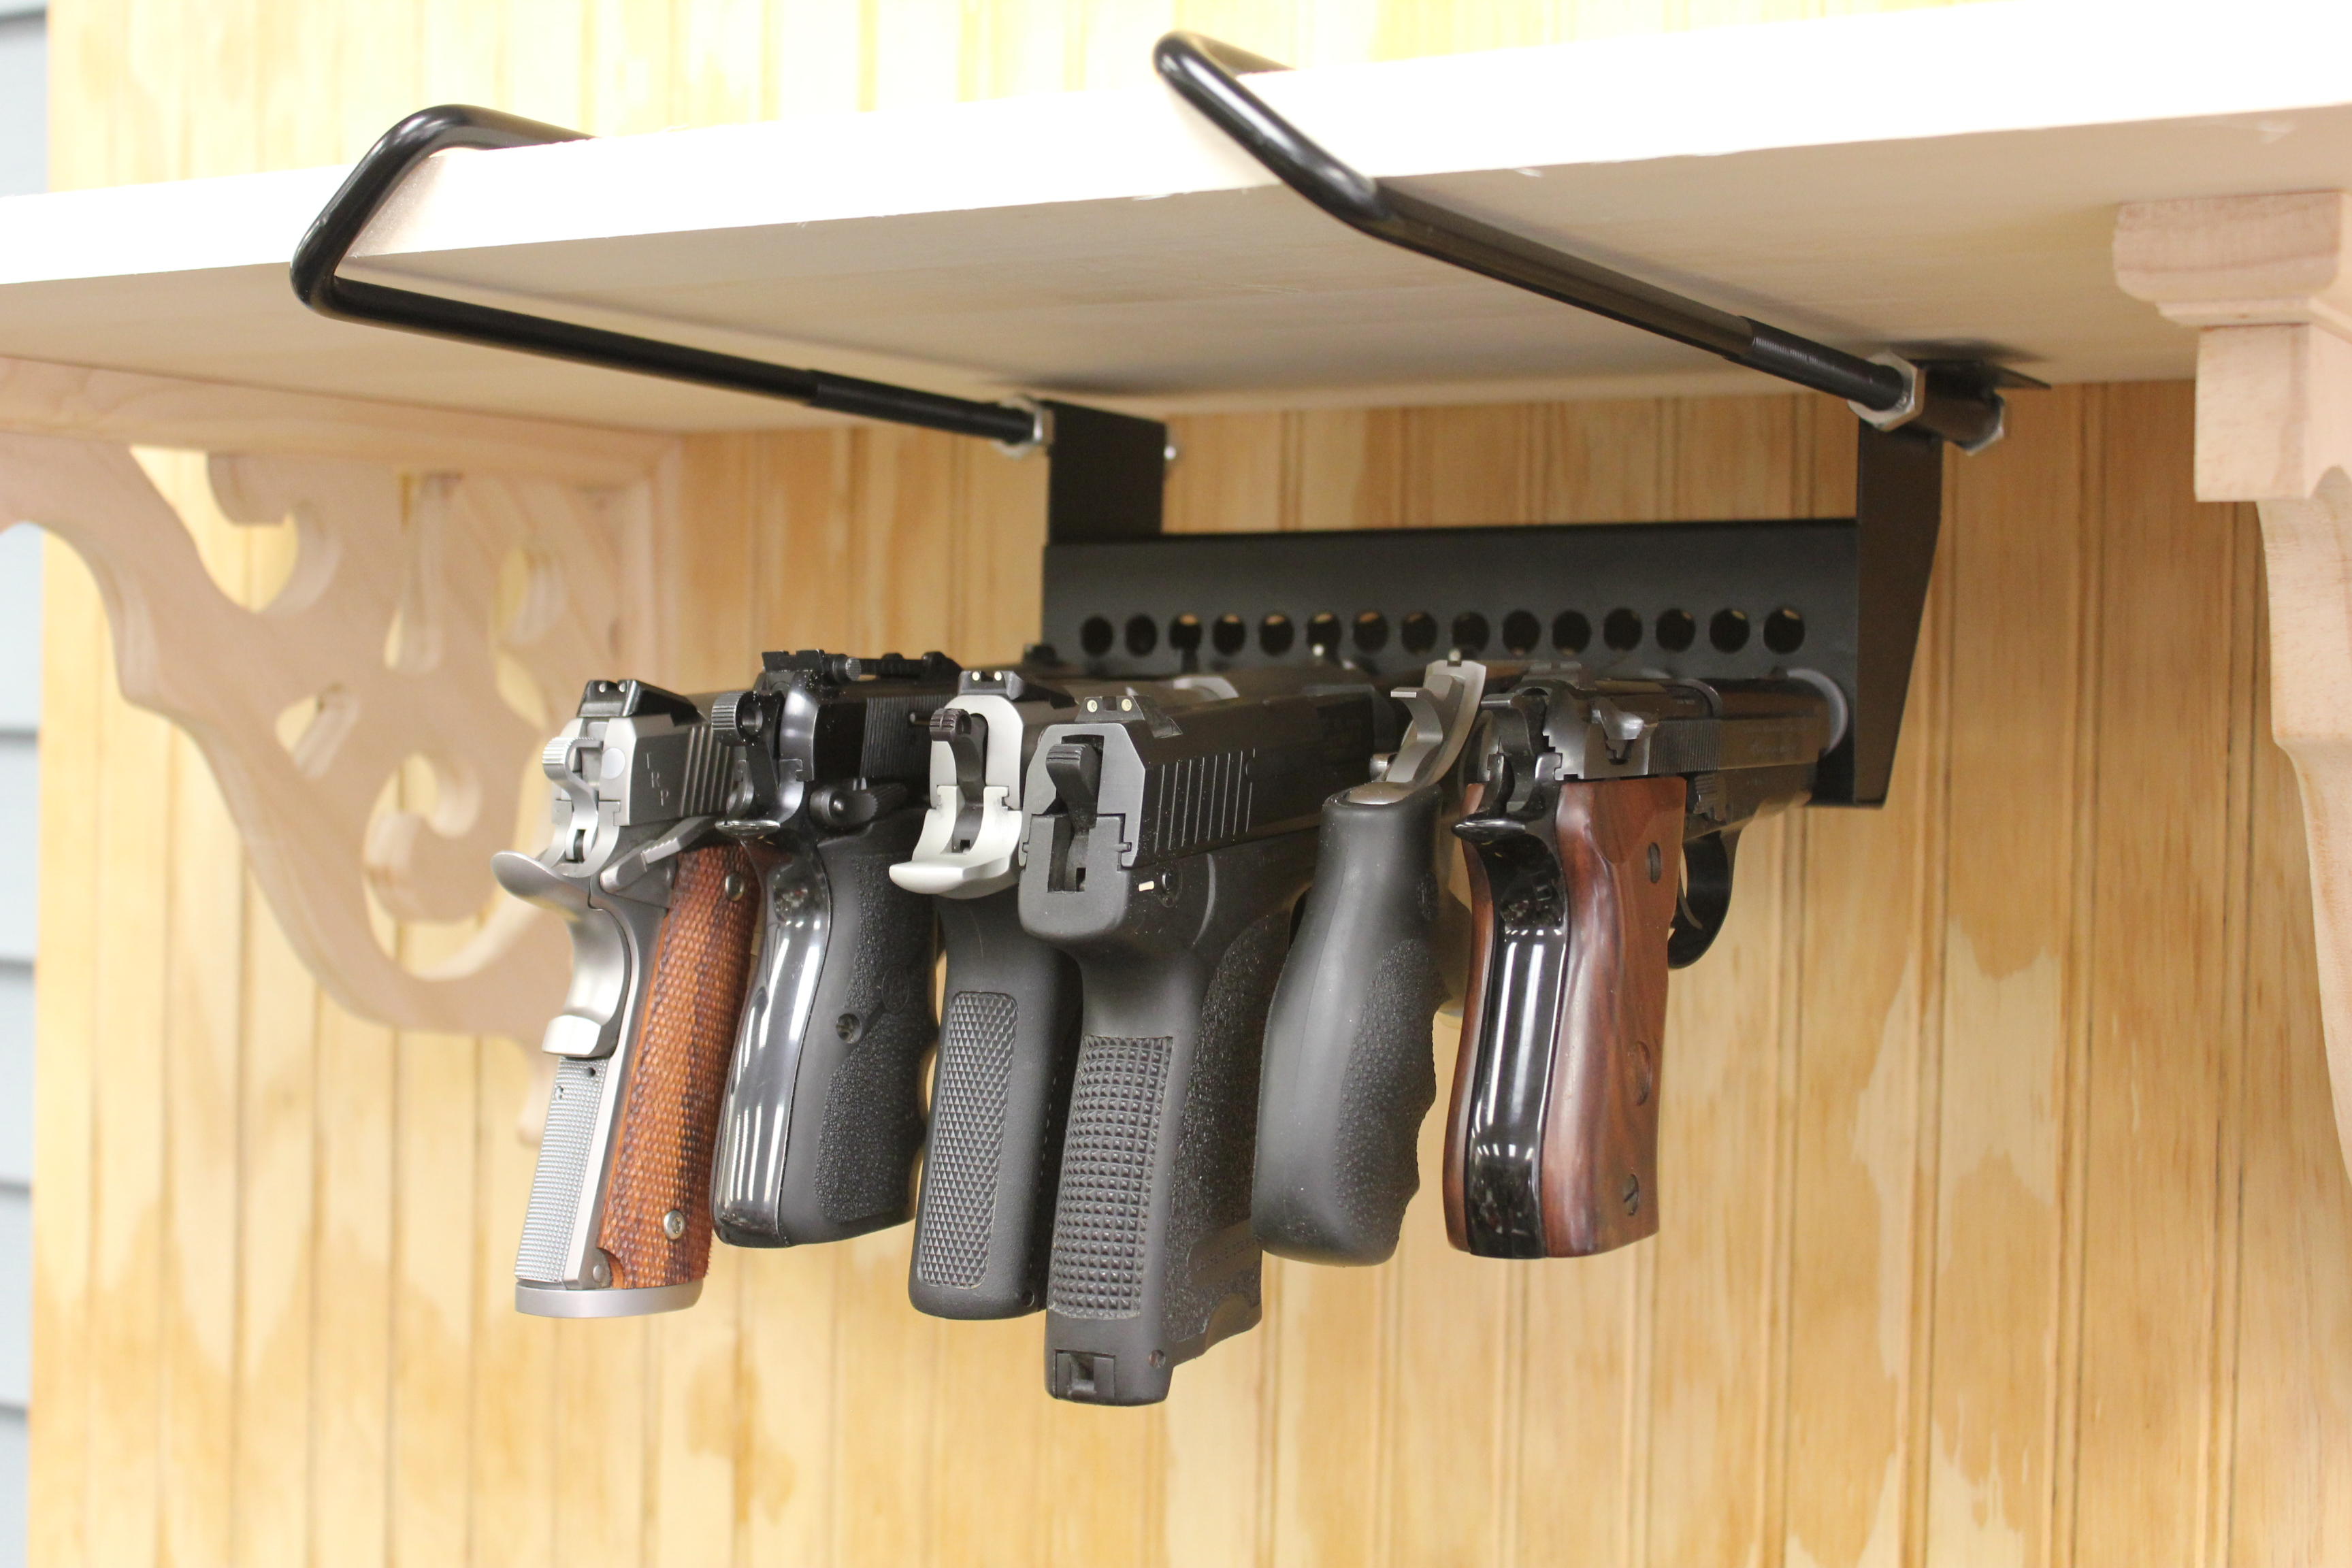 Hyskore R Announces An Expanded Line Of Gun Storage